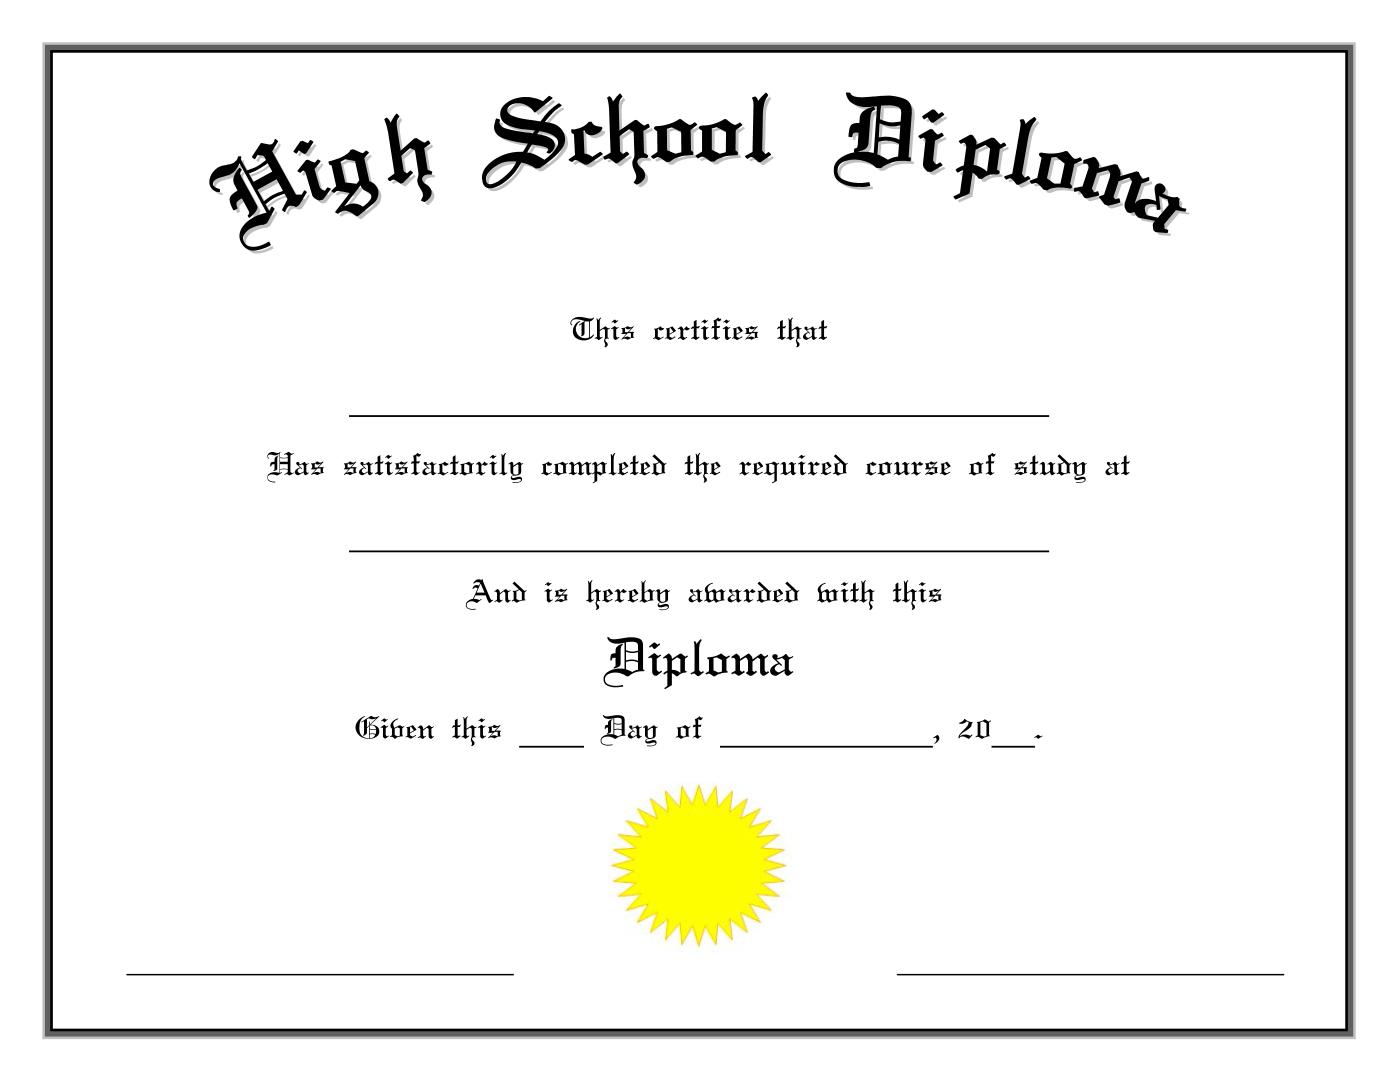 High School Diploma - Modèle Professionnel Regarding Graduation Certificate Template Word